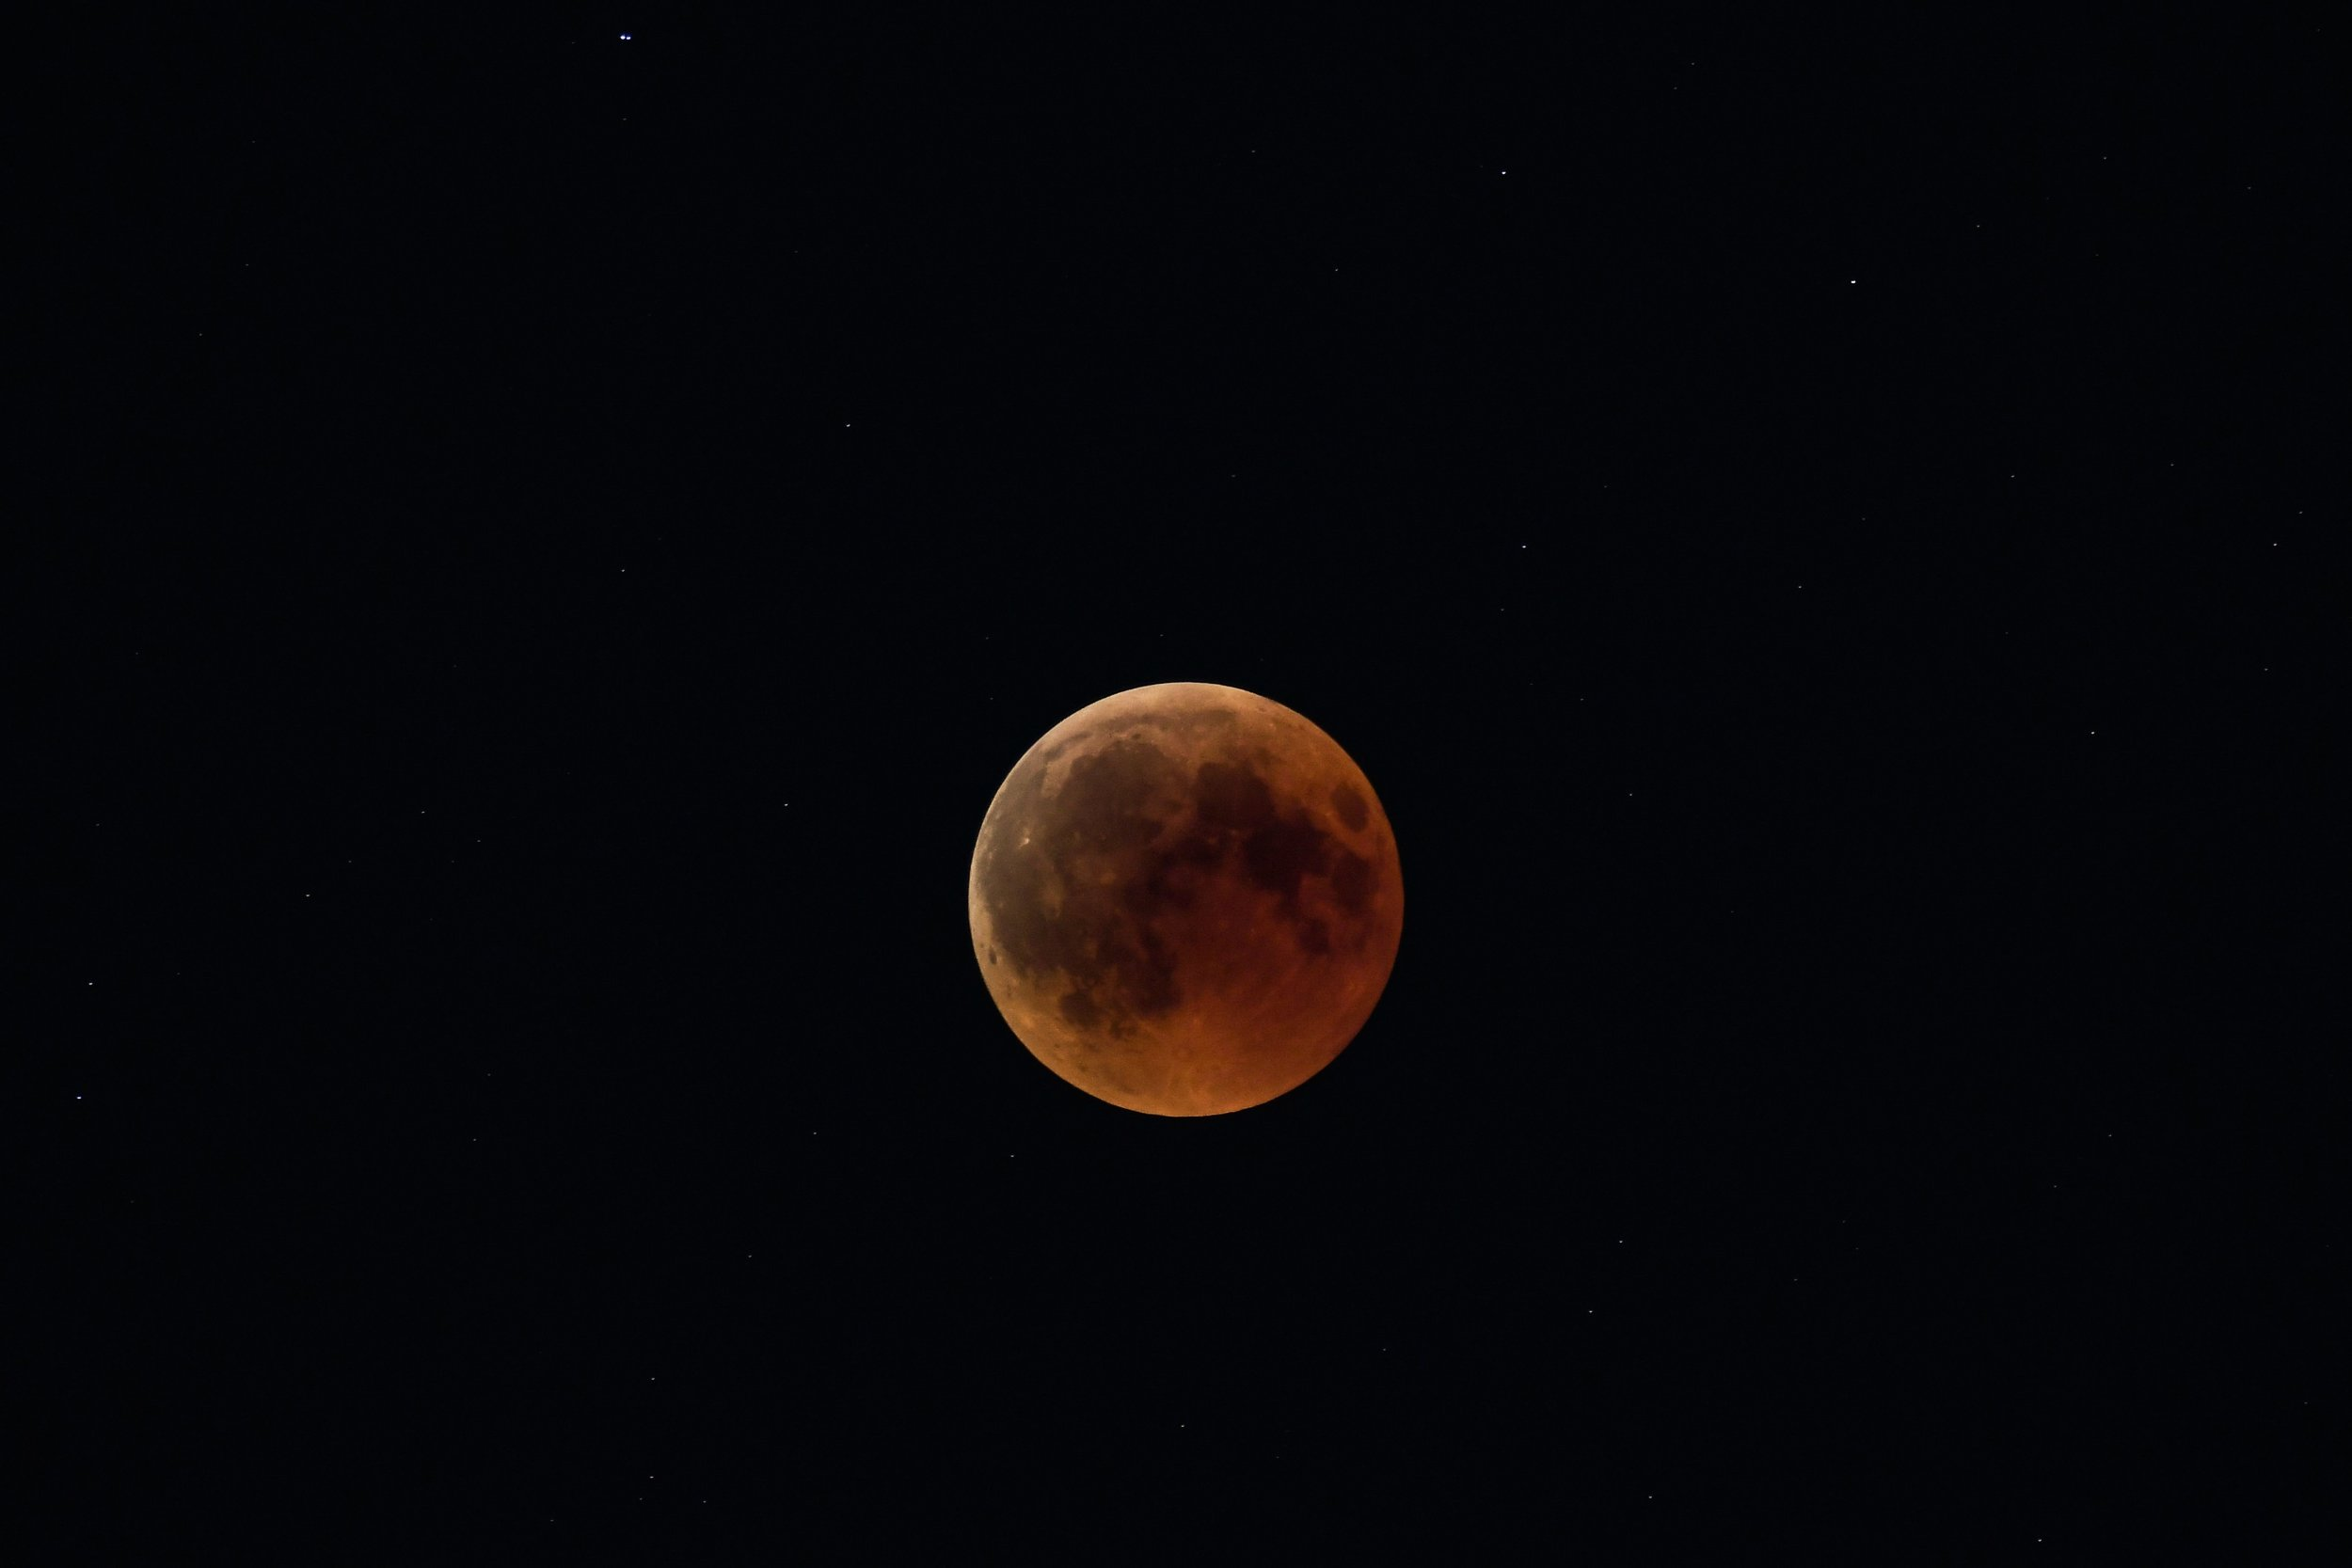 blood moon january 2019 est time - photo #18